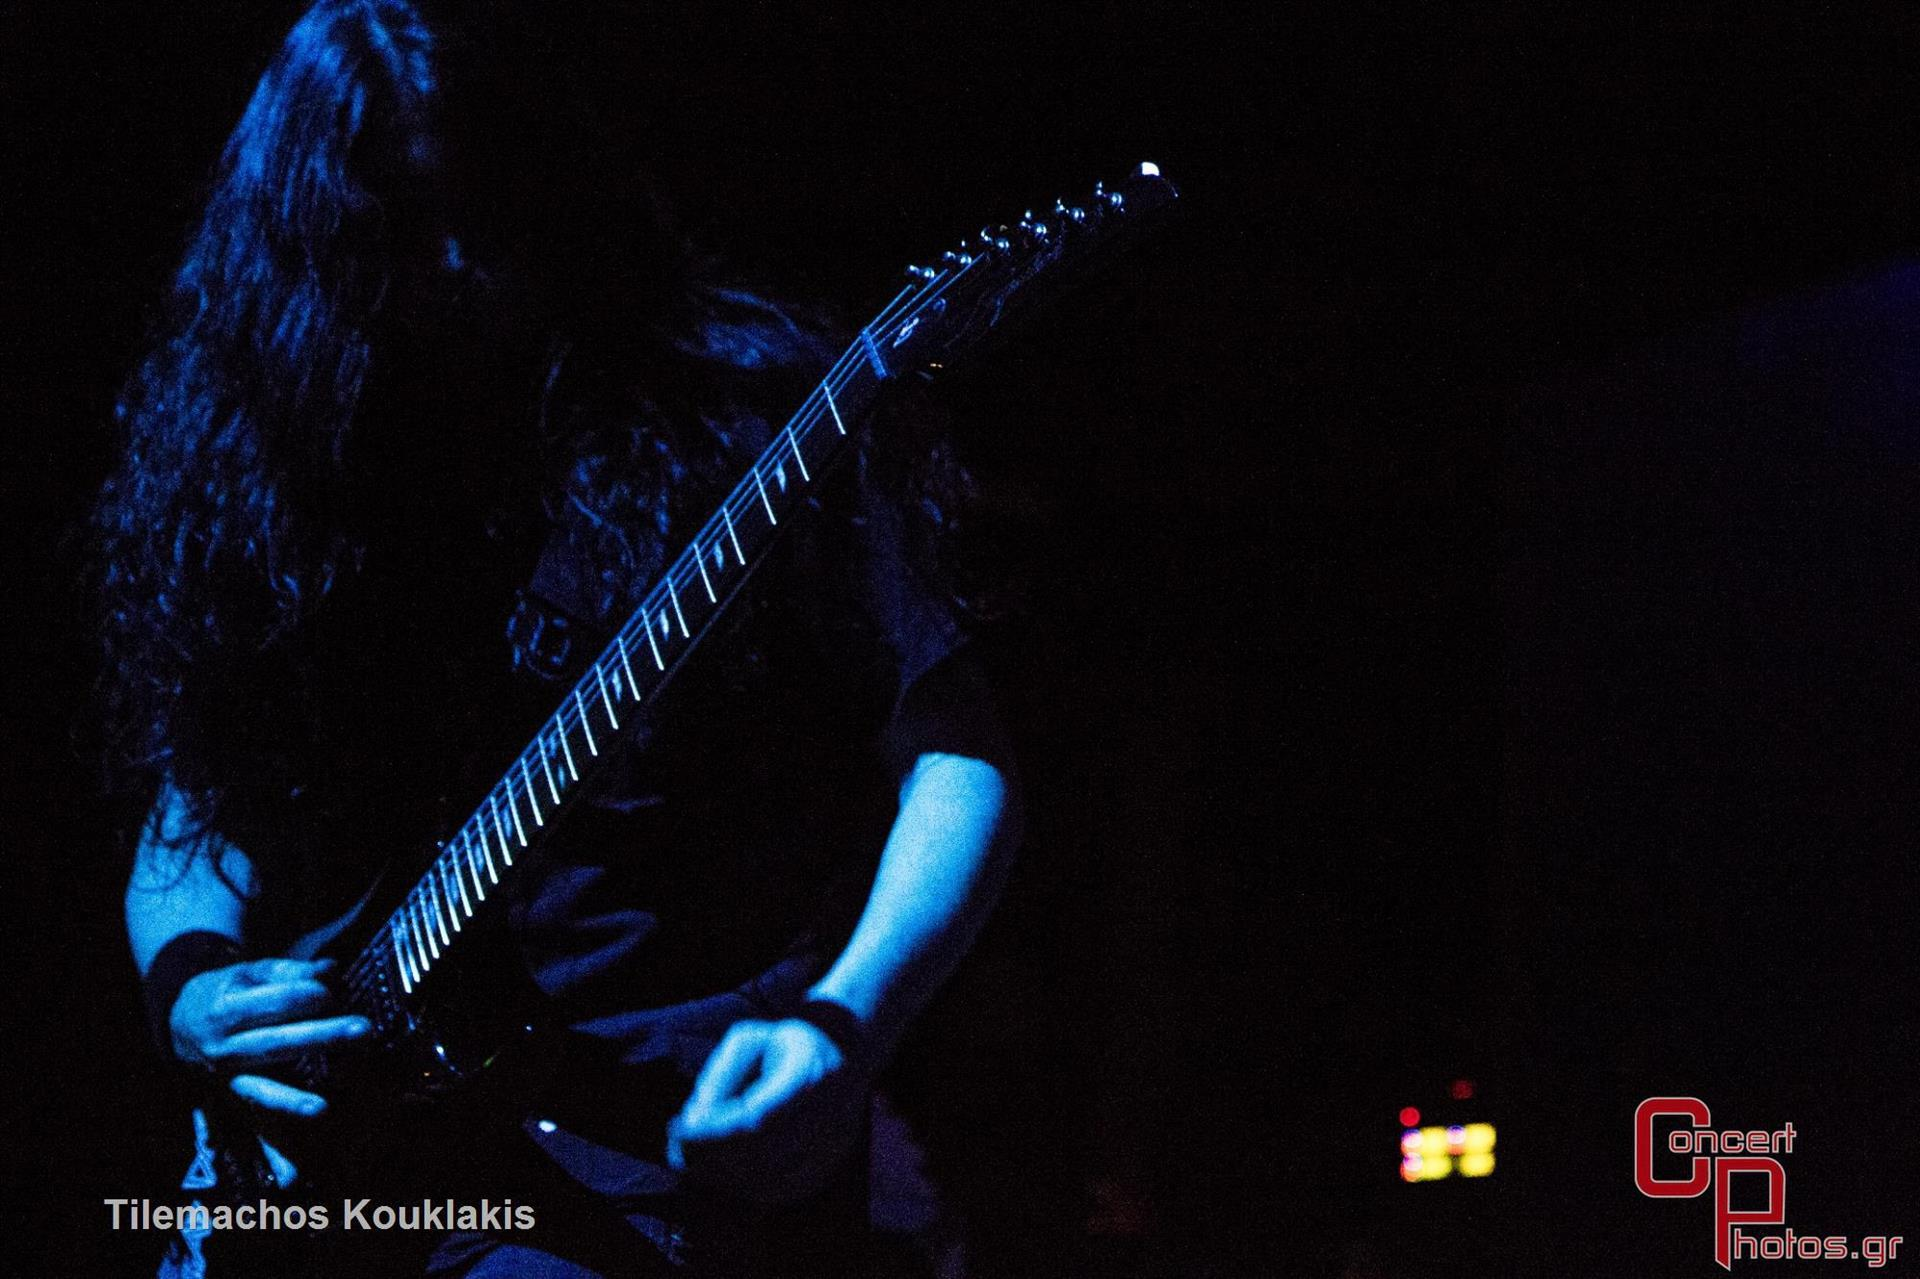 Anthrax-Anthrax photographer: Tilemachos Kouklakis - IMG_1695